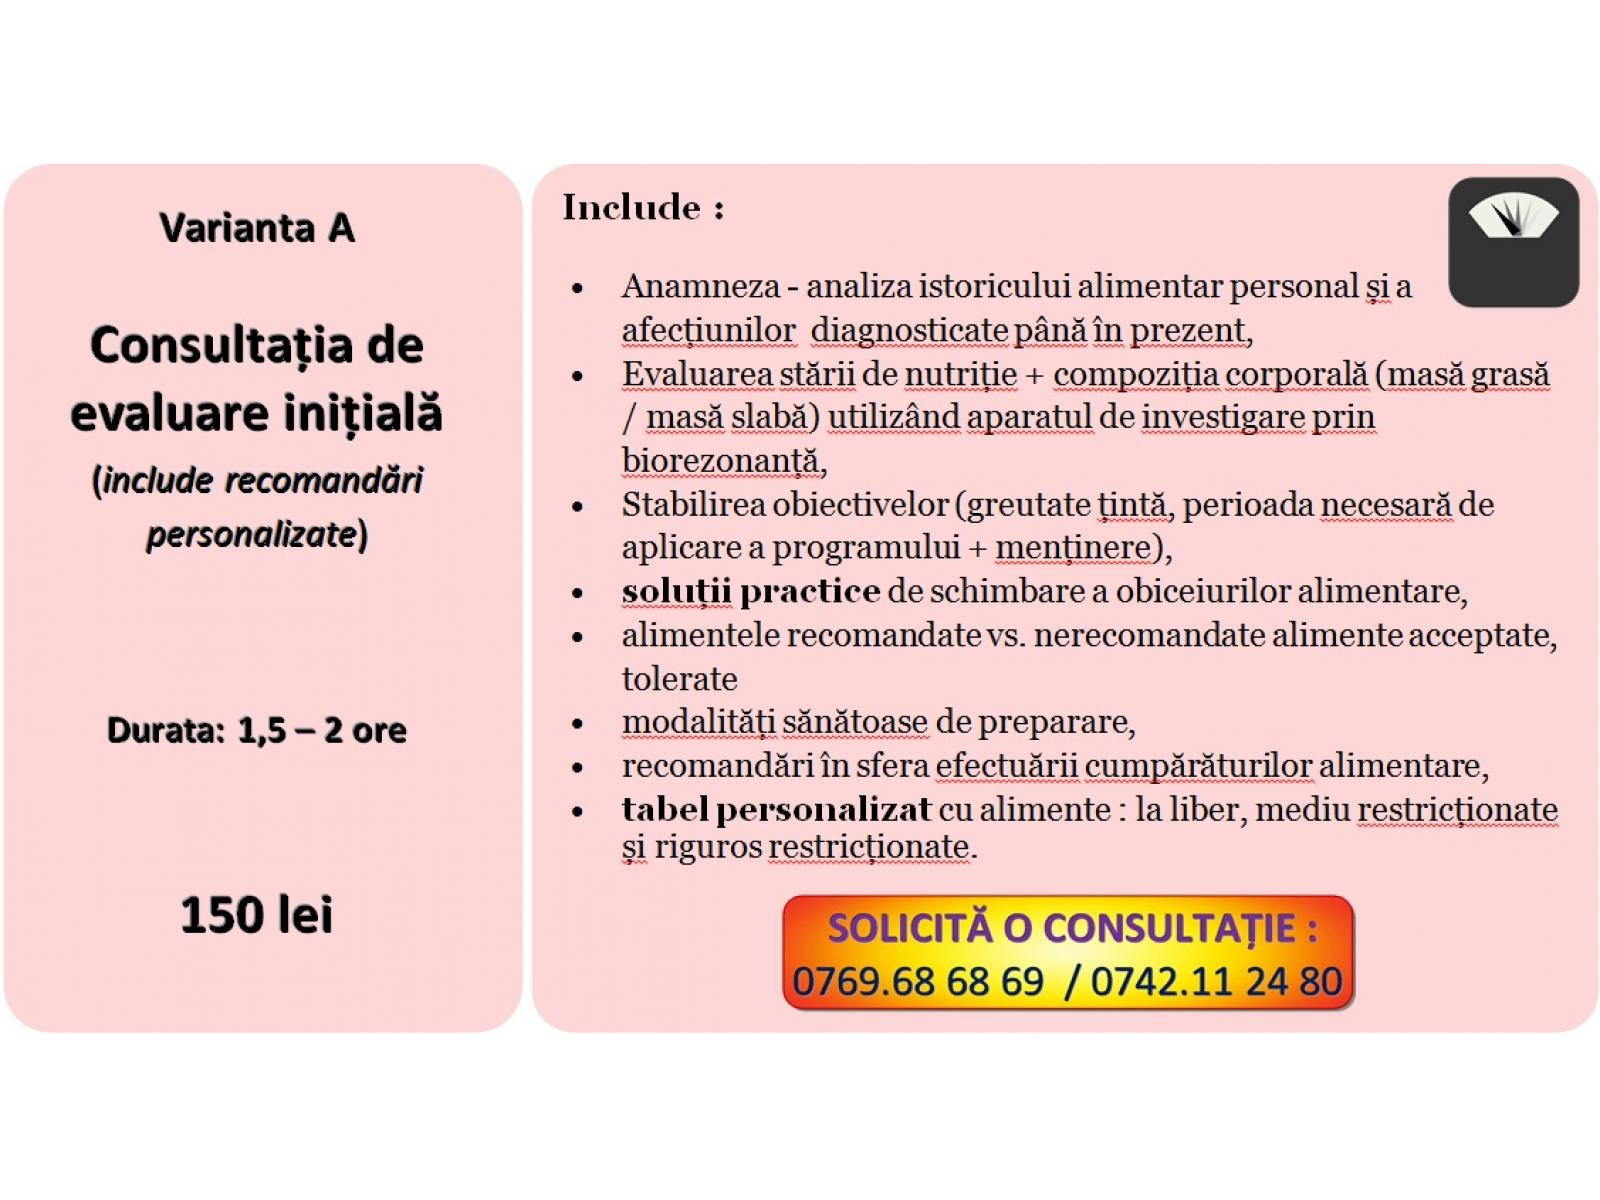 Cabinet de Nutritie si Dietetica - Constantin Tibirna - Program_individual_Varianta_A.jpg